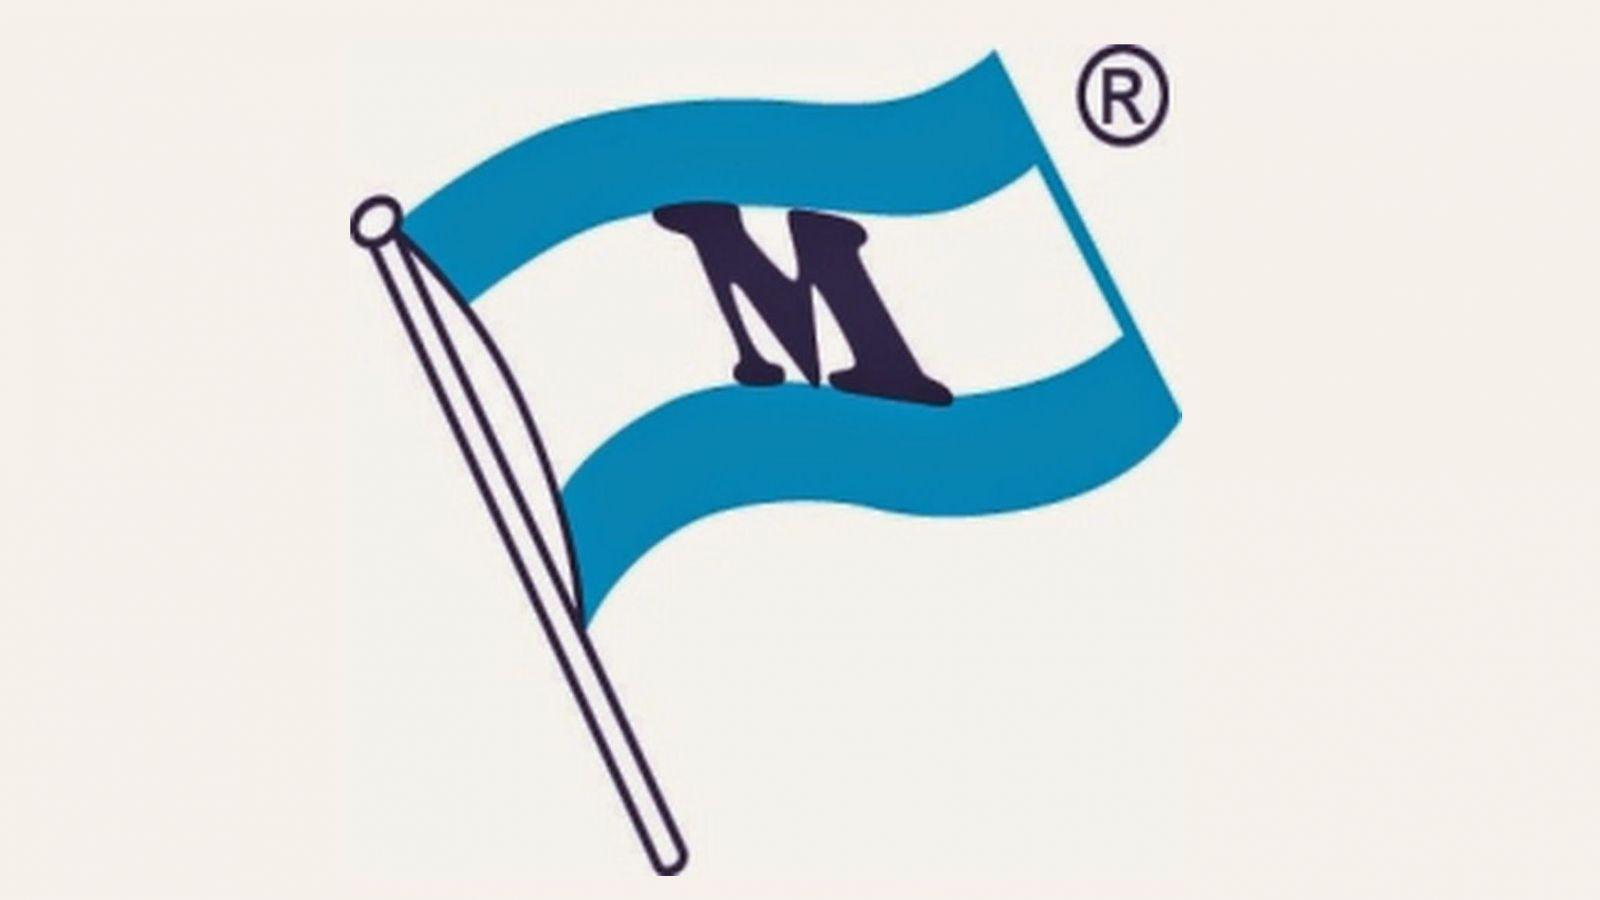 Medov logo